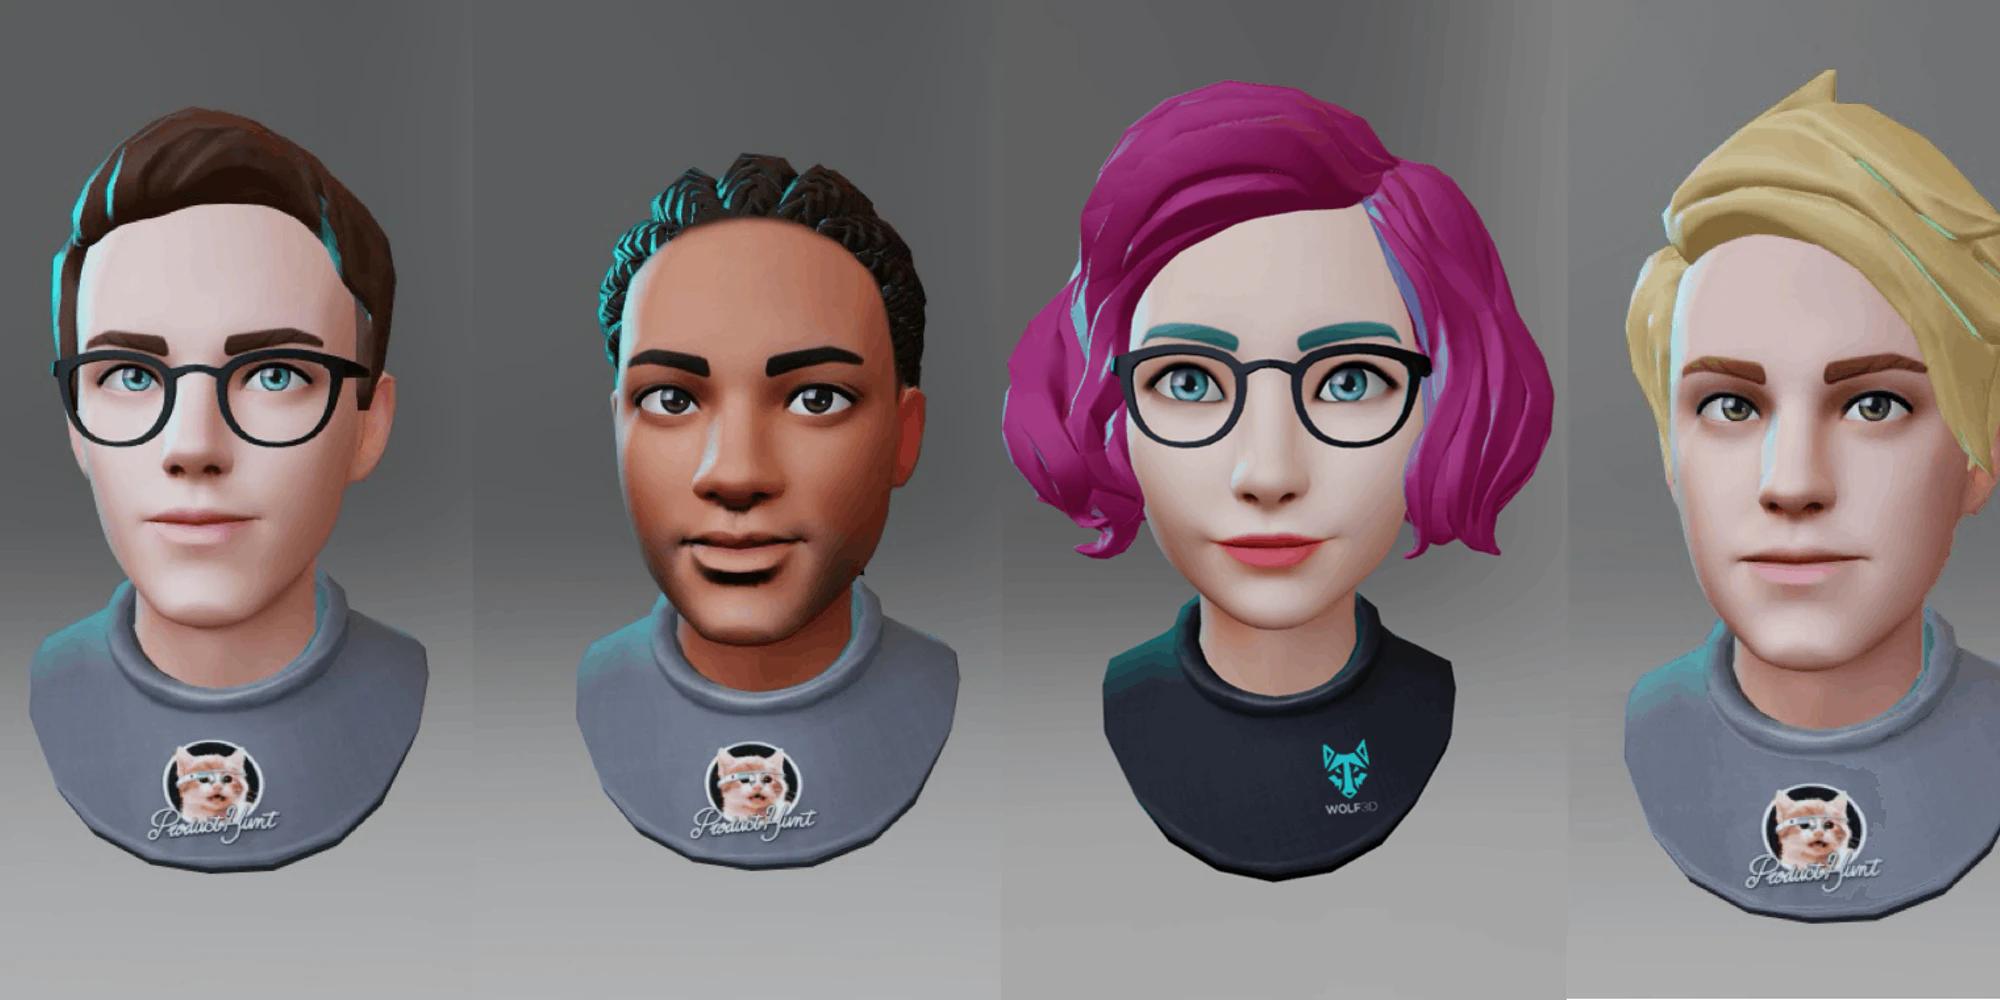 ReadyPlayerMe 3D avatars for Mozilla Hubs